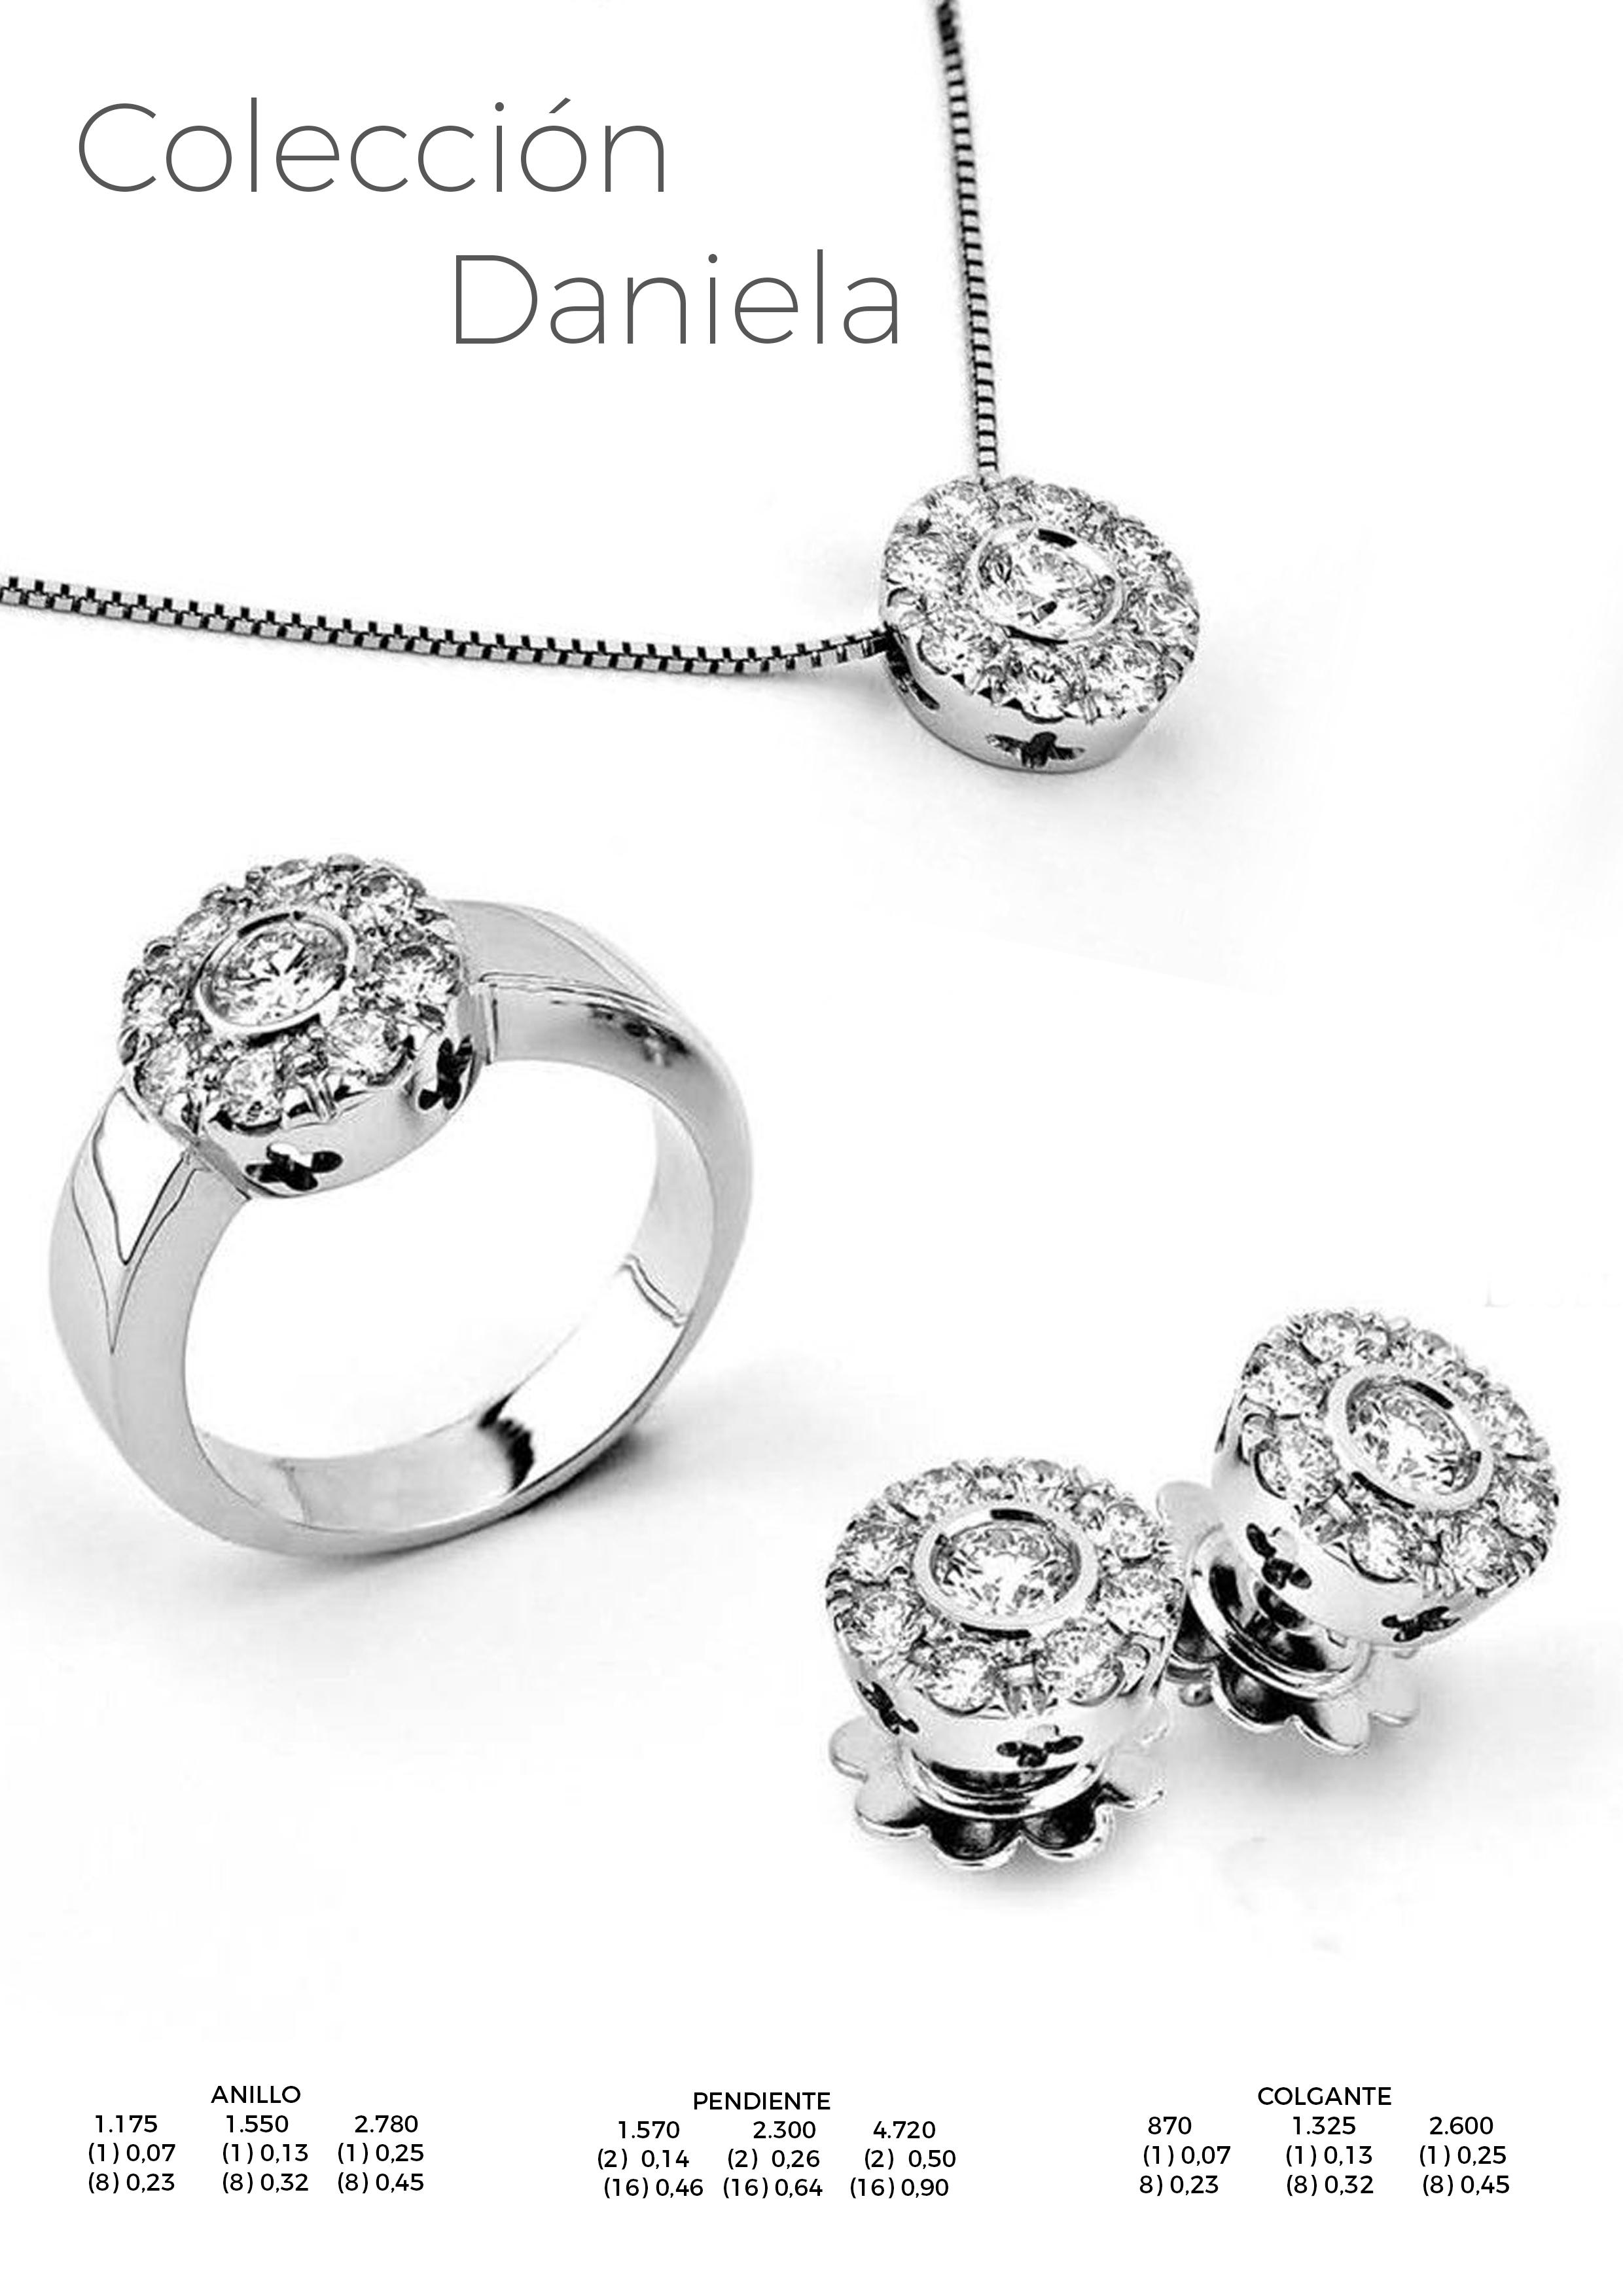 coleccion daniela - anillo, pendiente y colgante roseton diamantes - joyeria marga mira